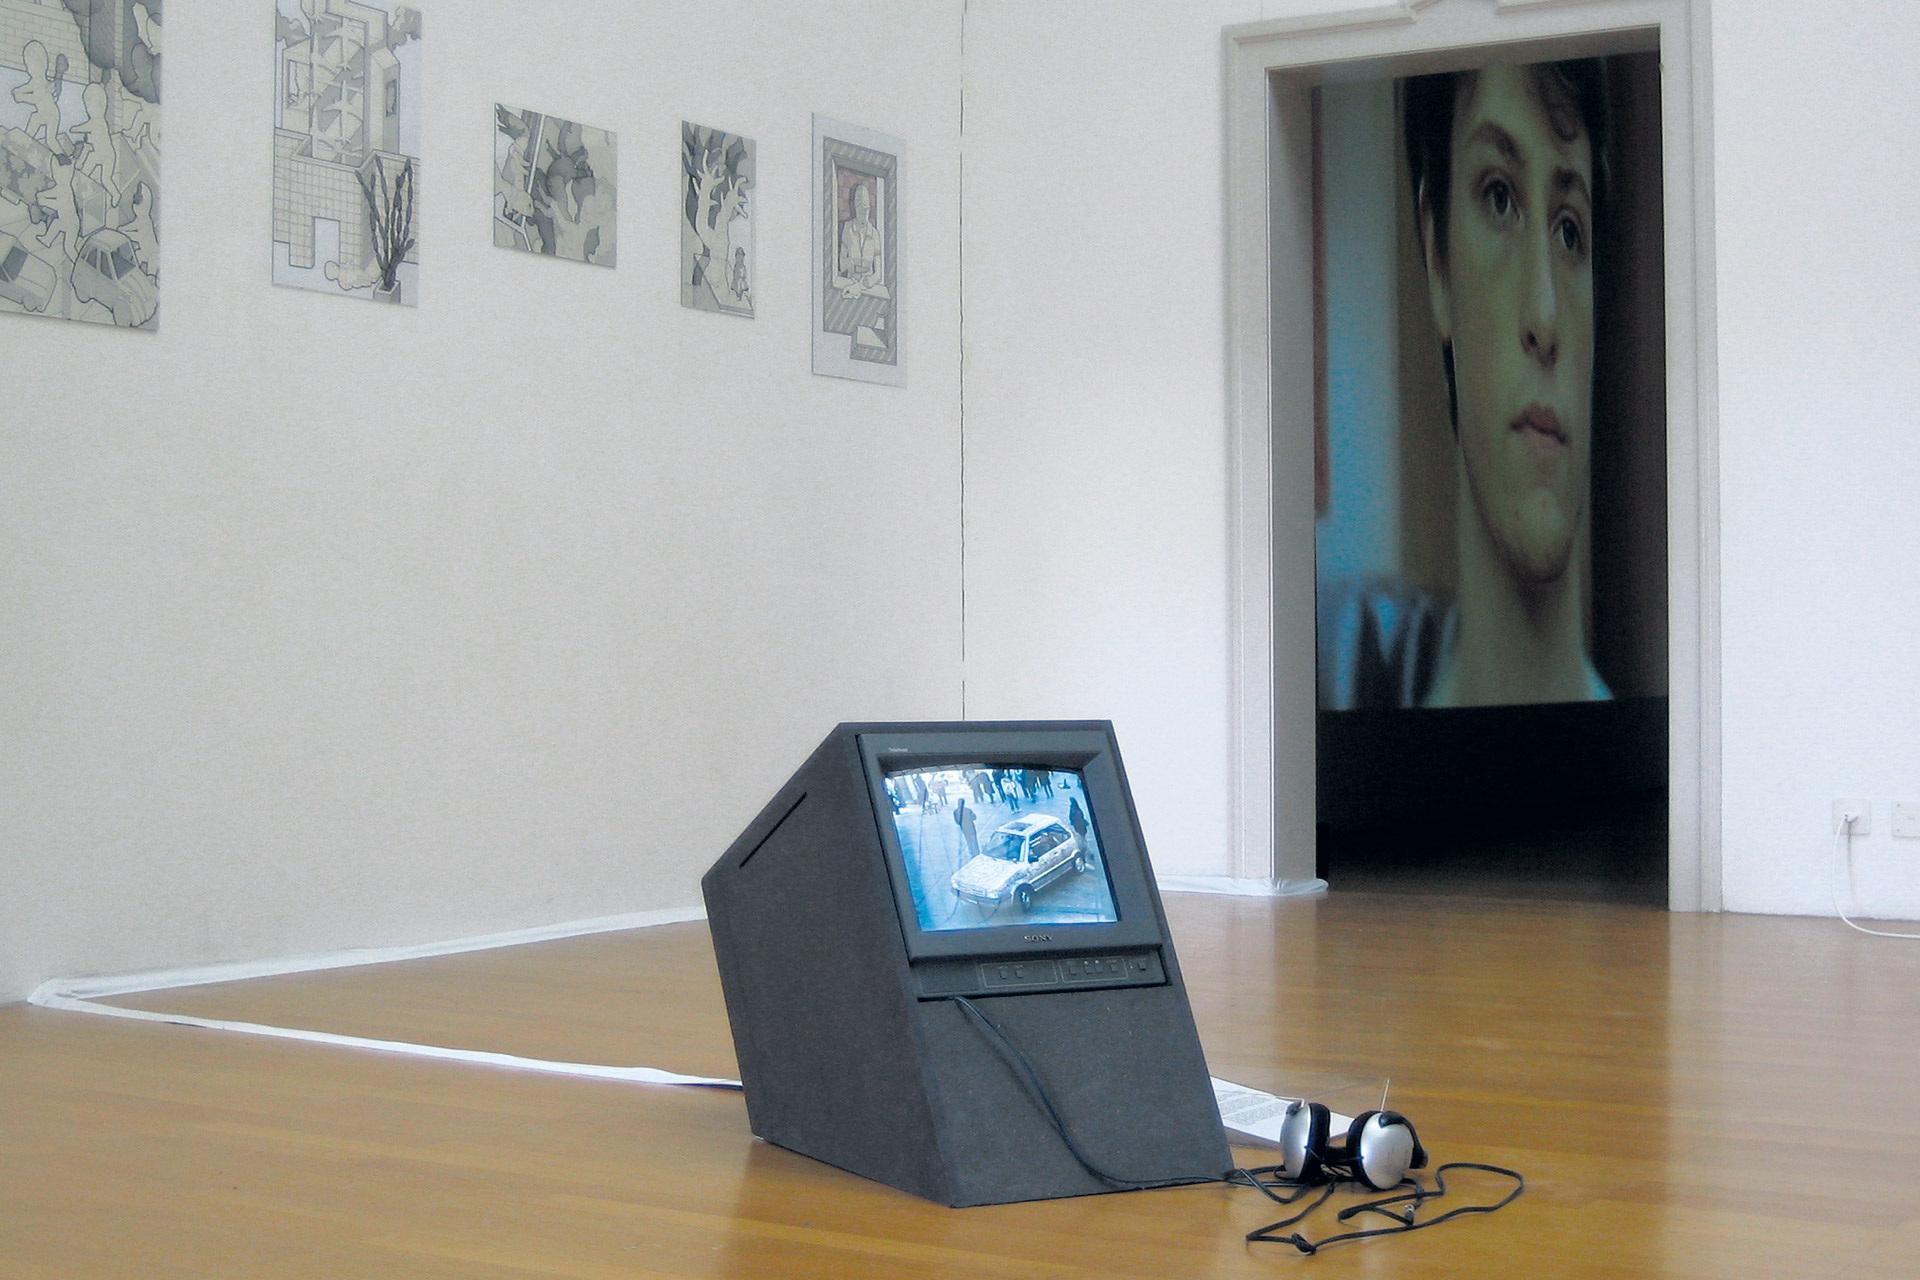 Winterthur-sucht-den-Superstar-Kunsthalle-Winterthur-2007-2.jpg